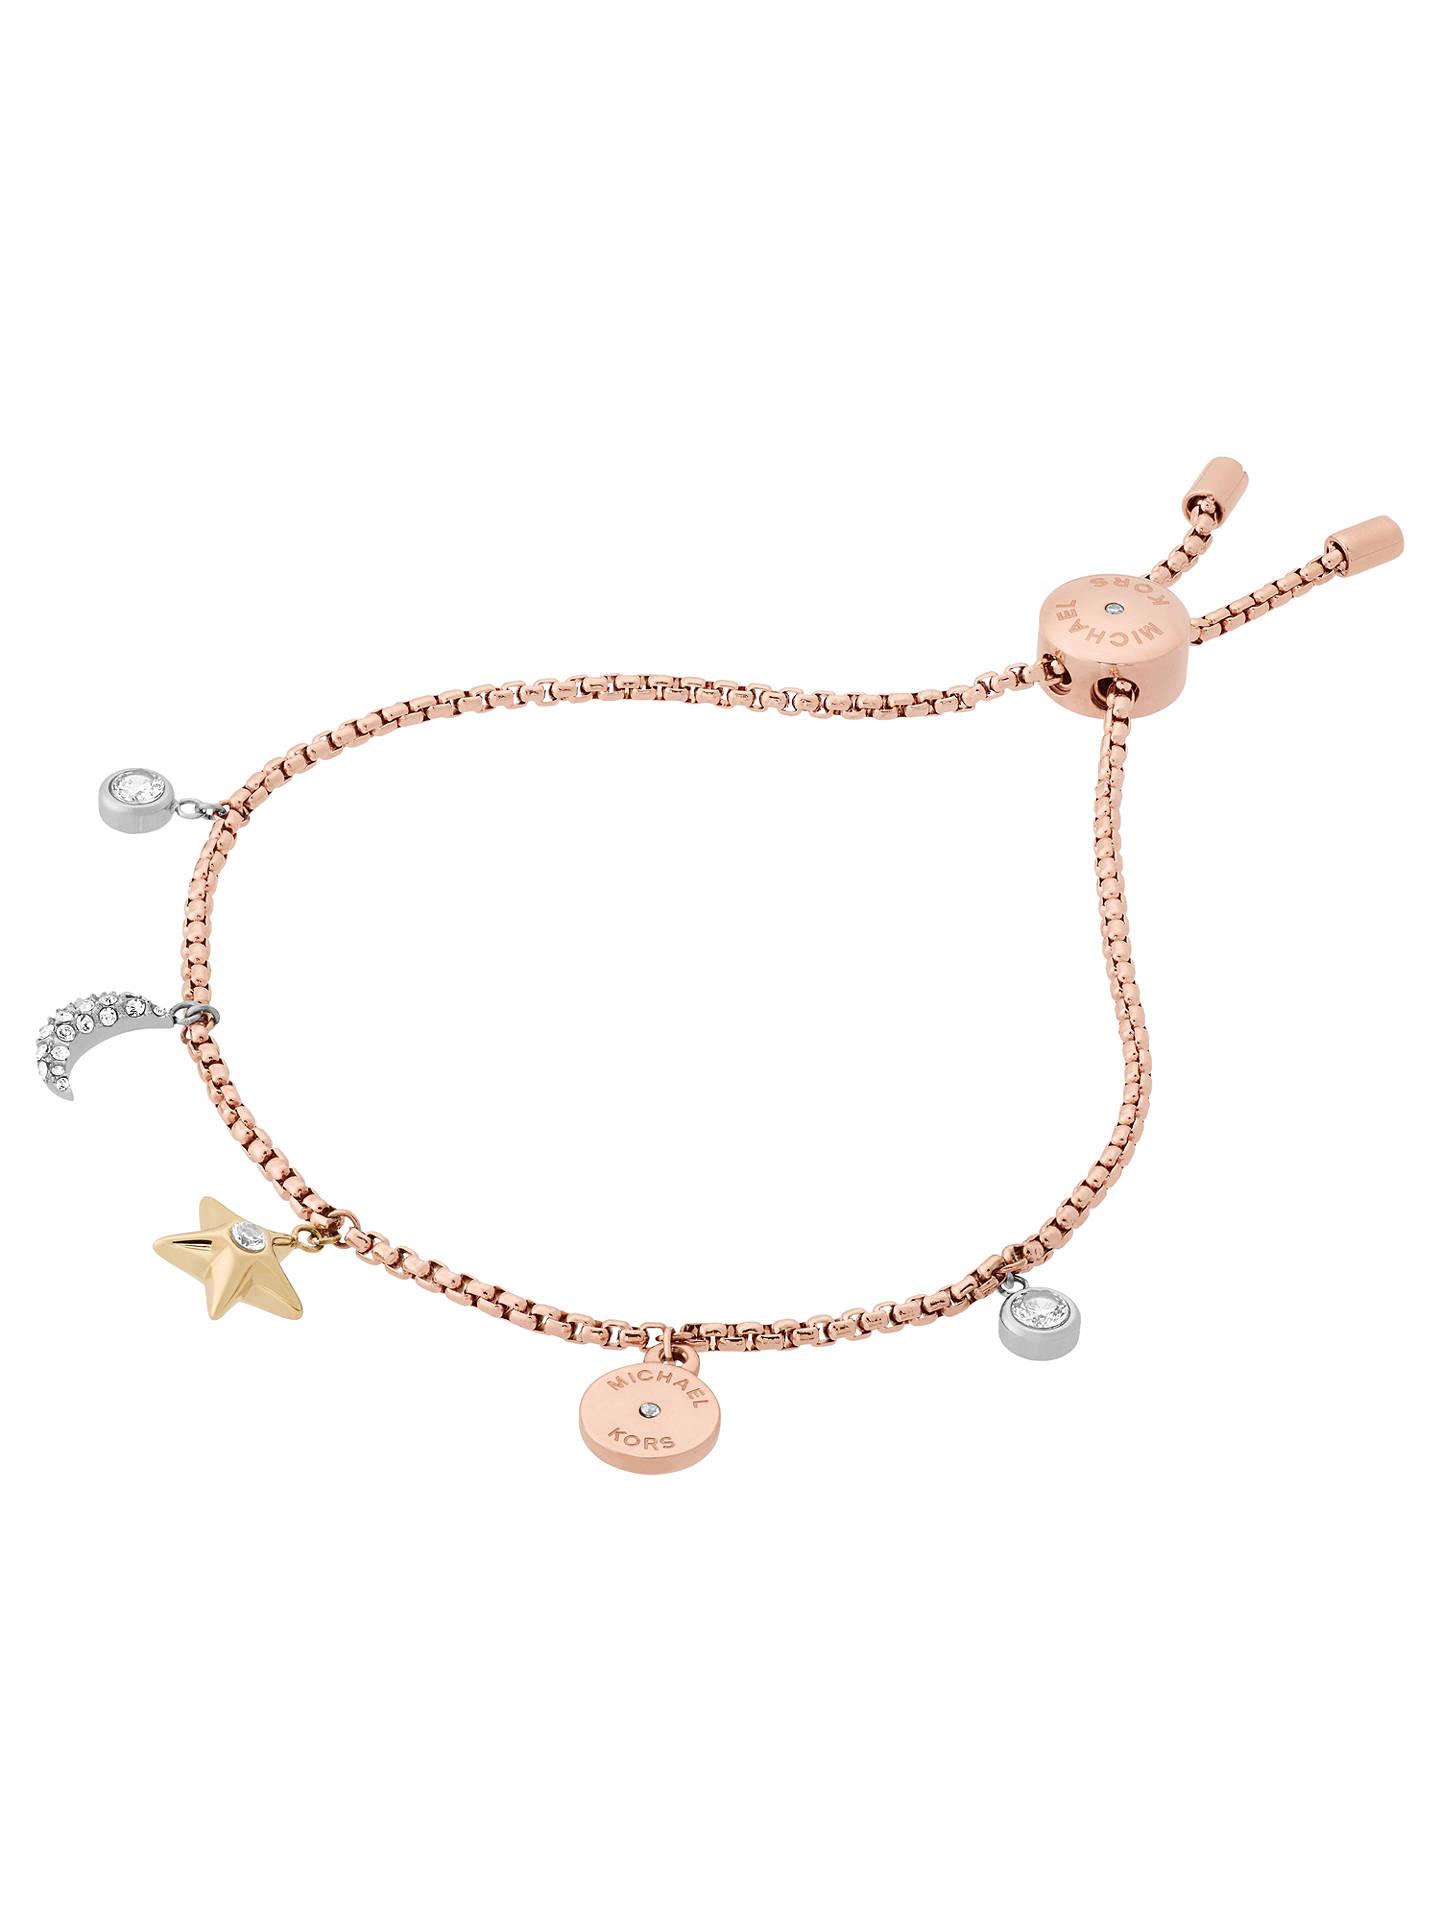 ecc862a958d6c Michael Kors Charm Bracelet, Rose Gold/Multi at John Lewis & Partners